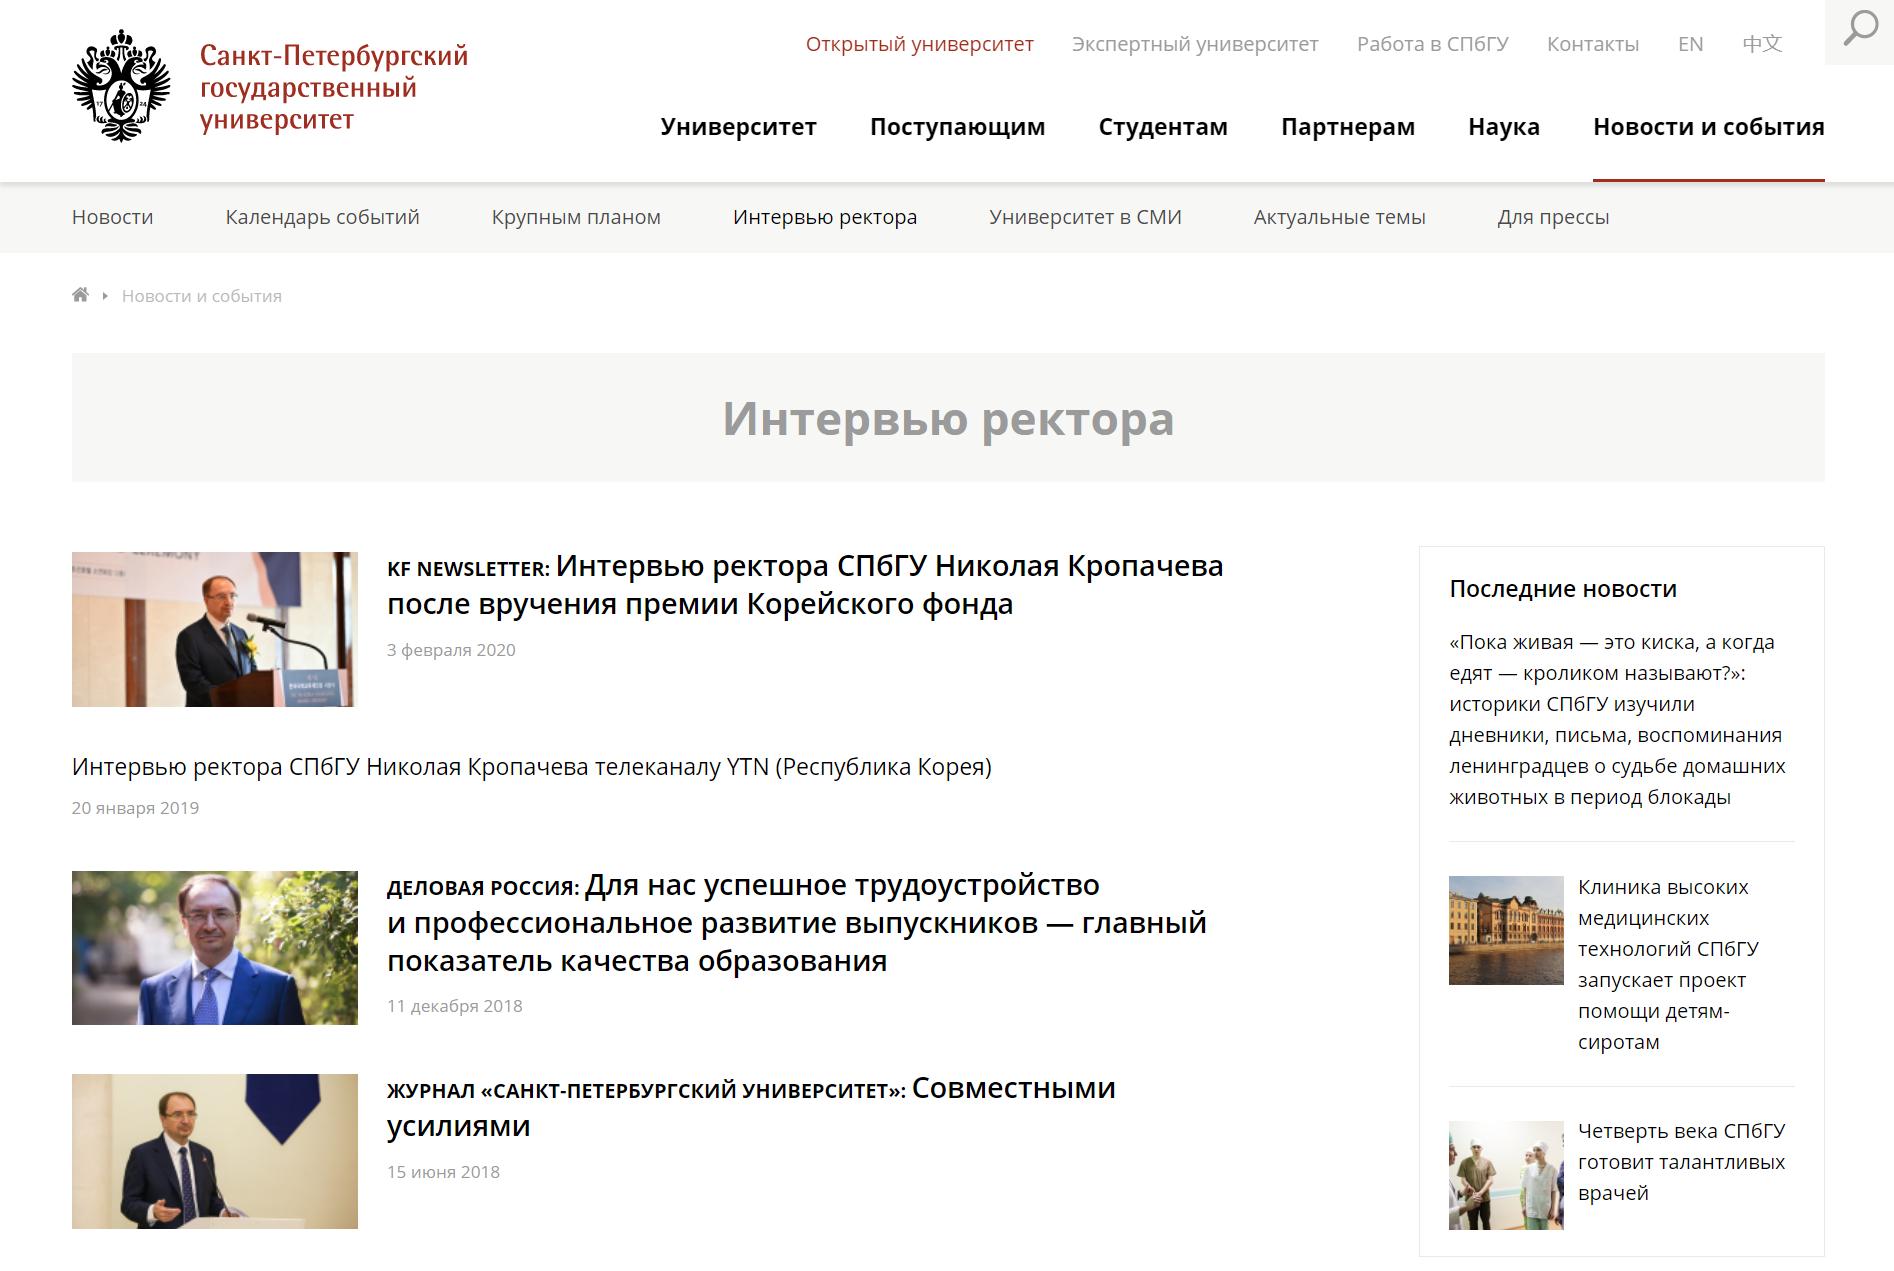 пресс-центр СПбГУ